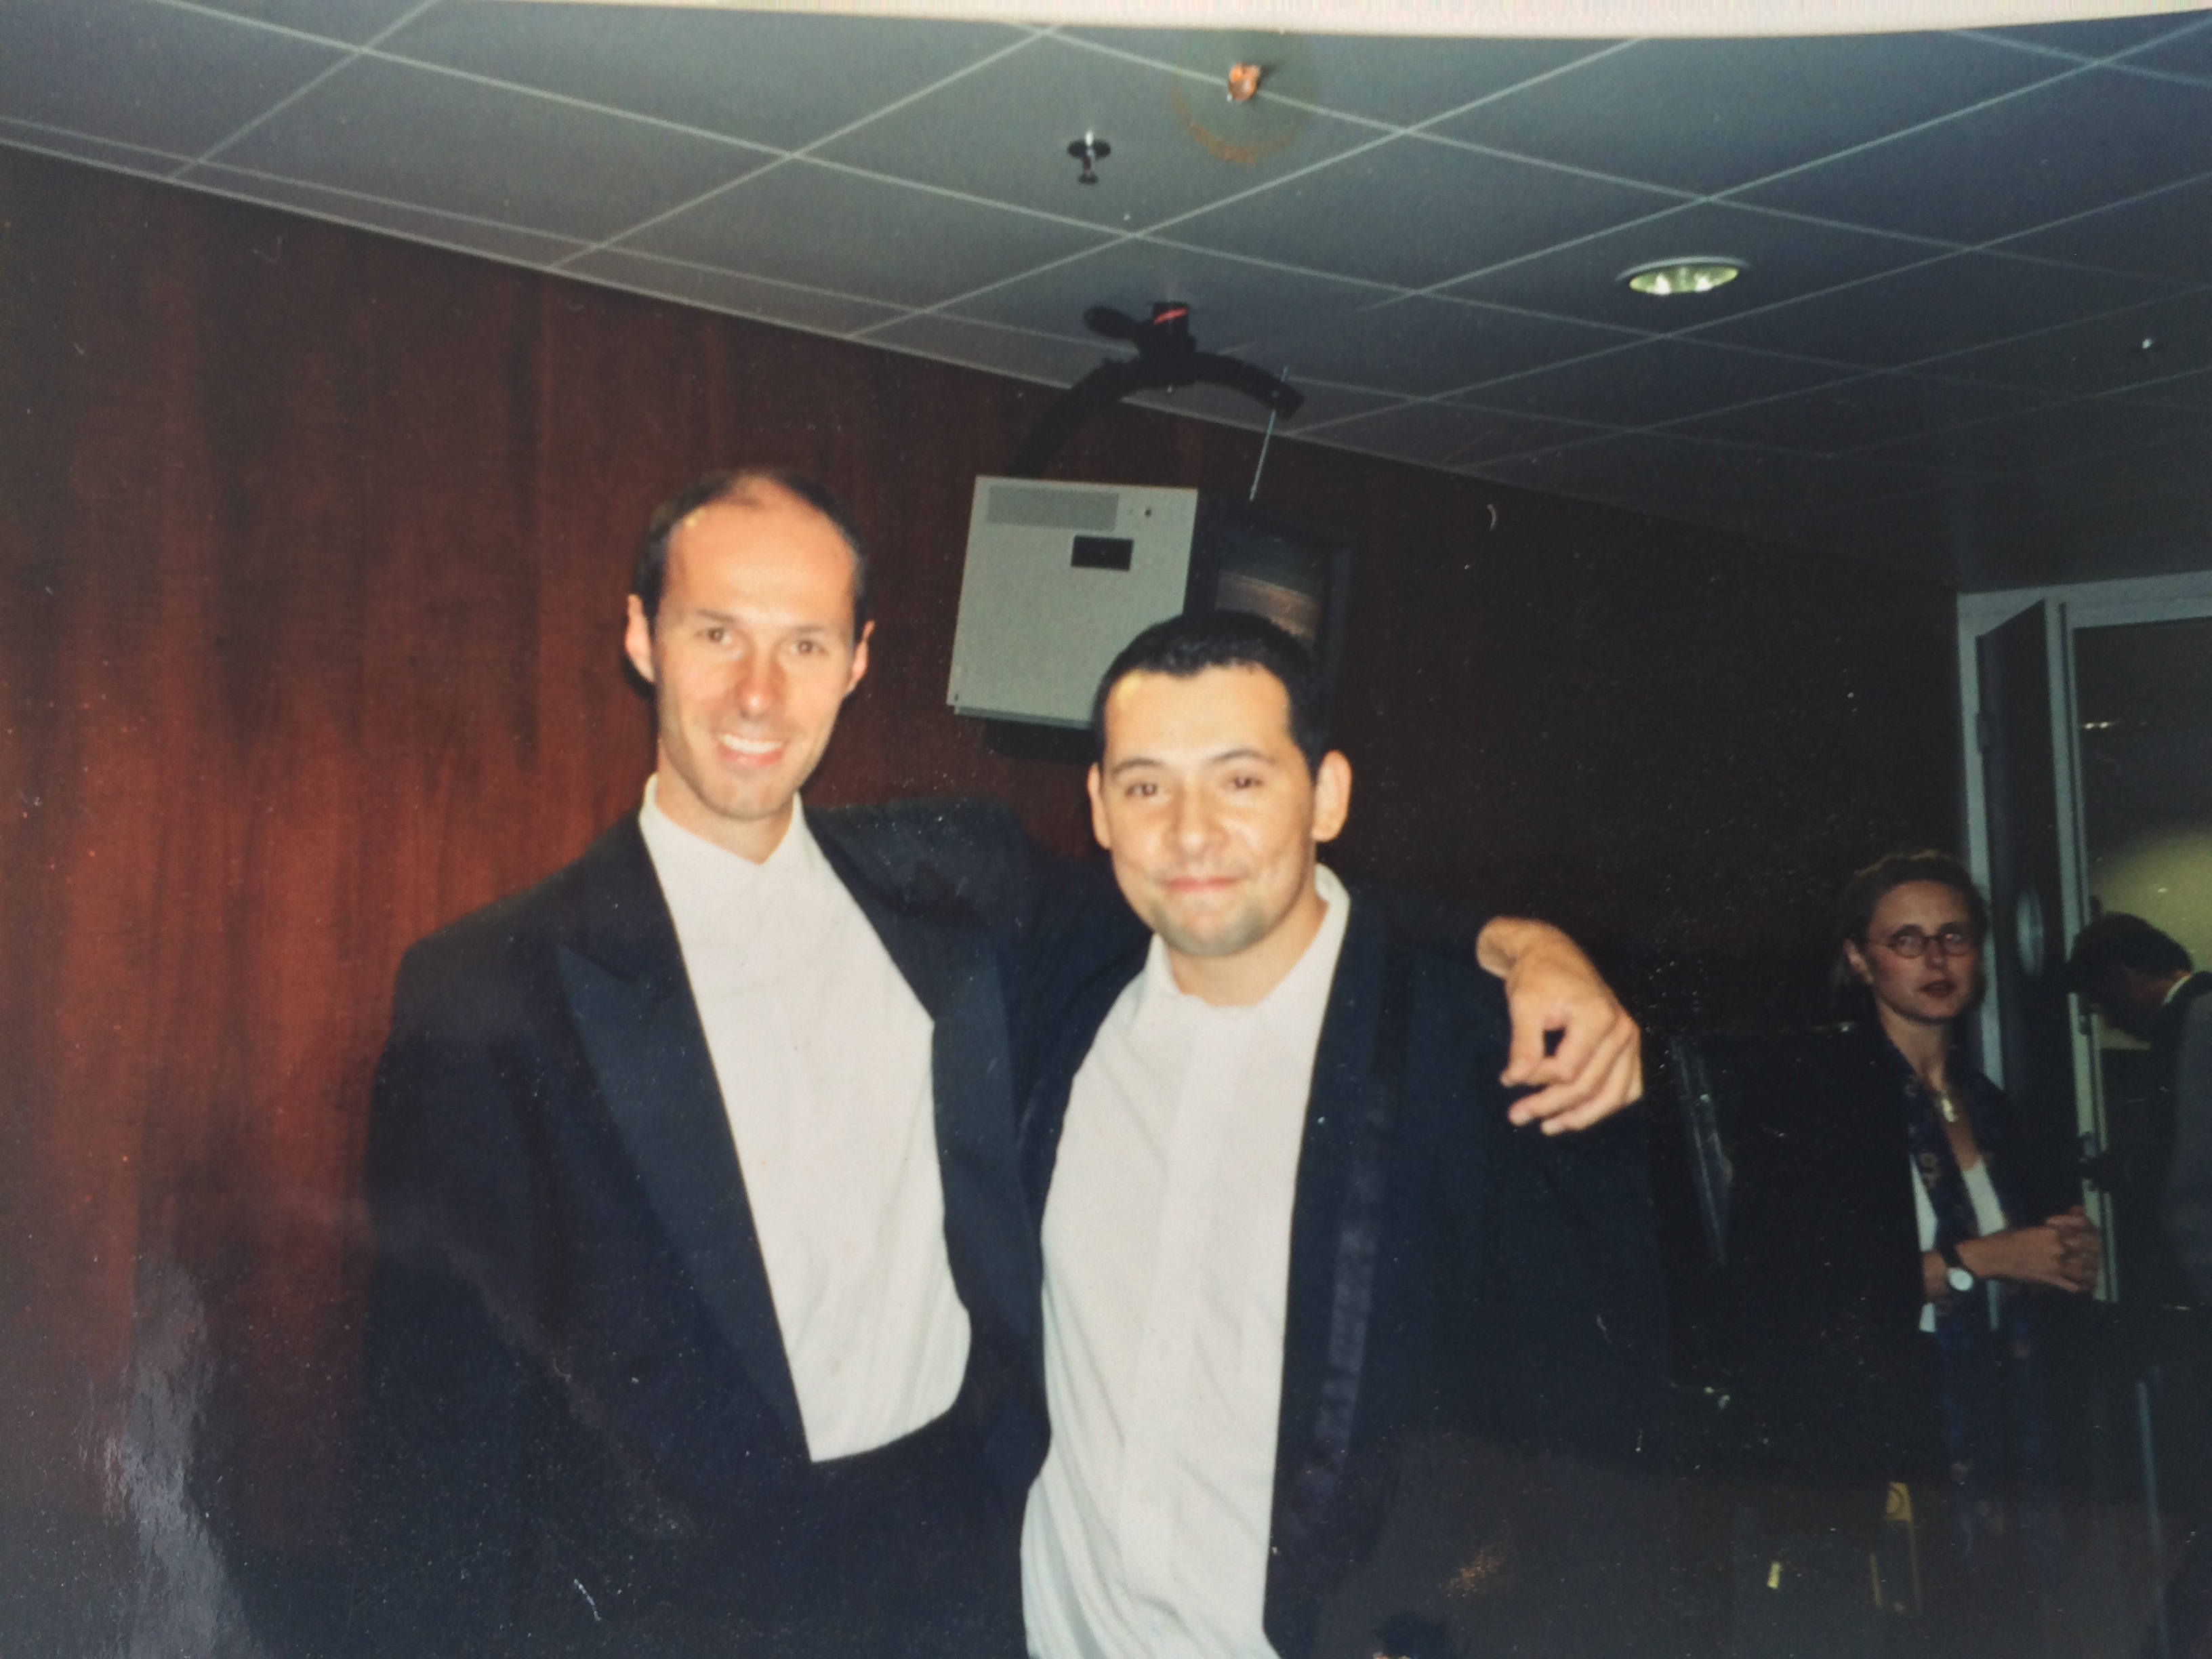 With  Stefan Schweigert